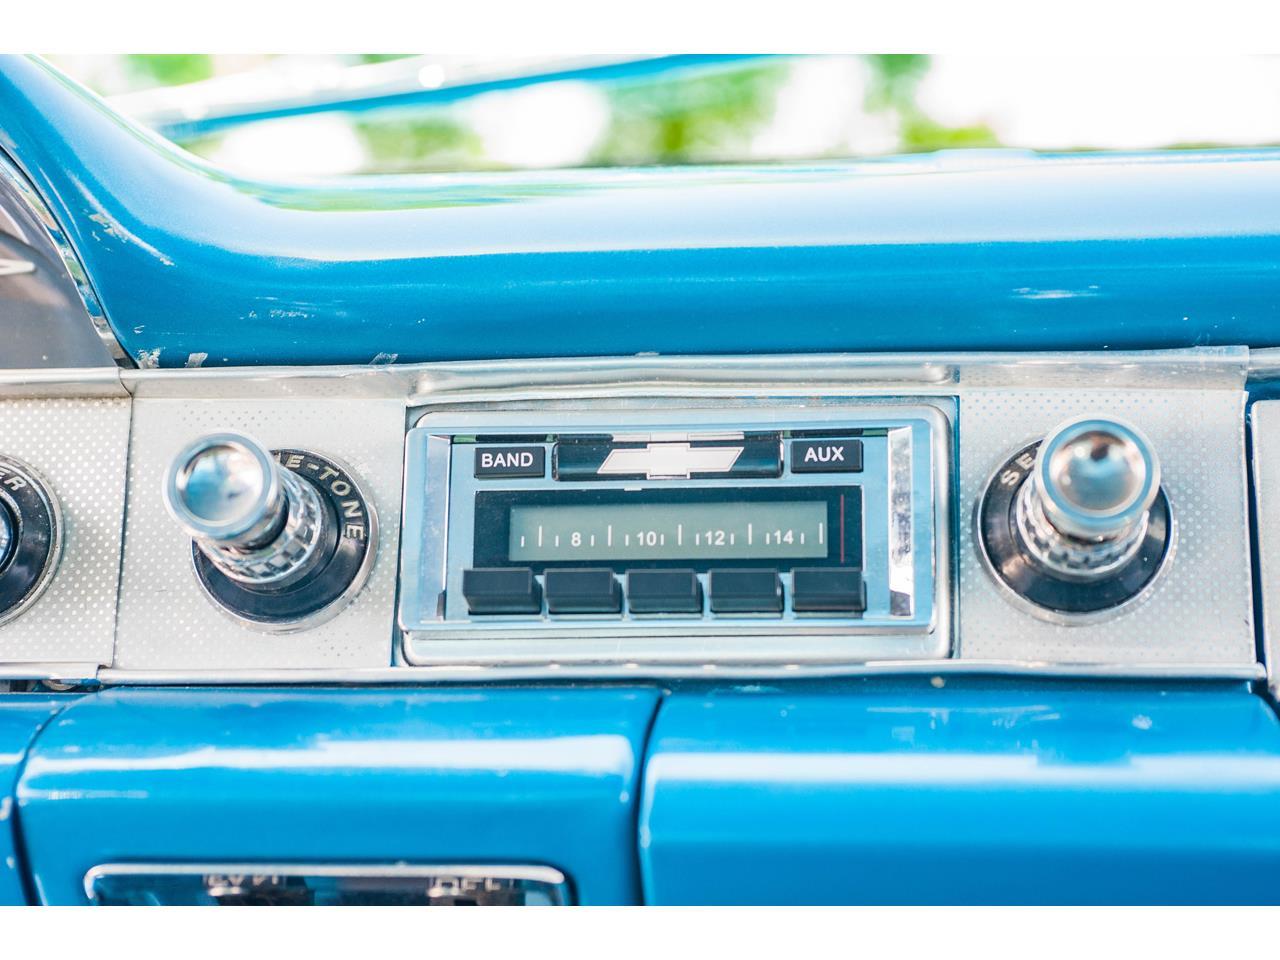 Large Picture of Classic '58 Chevrolet Impala located in Illinois - $62,000.00 - QB9Q